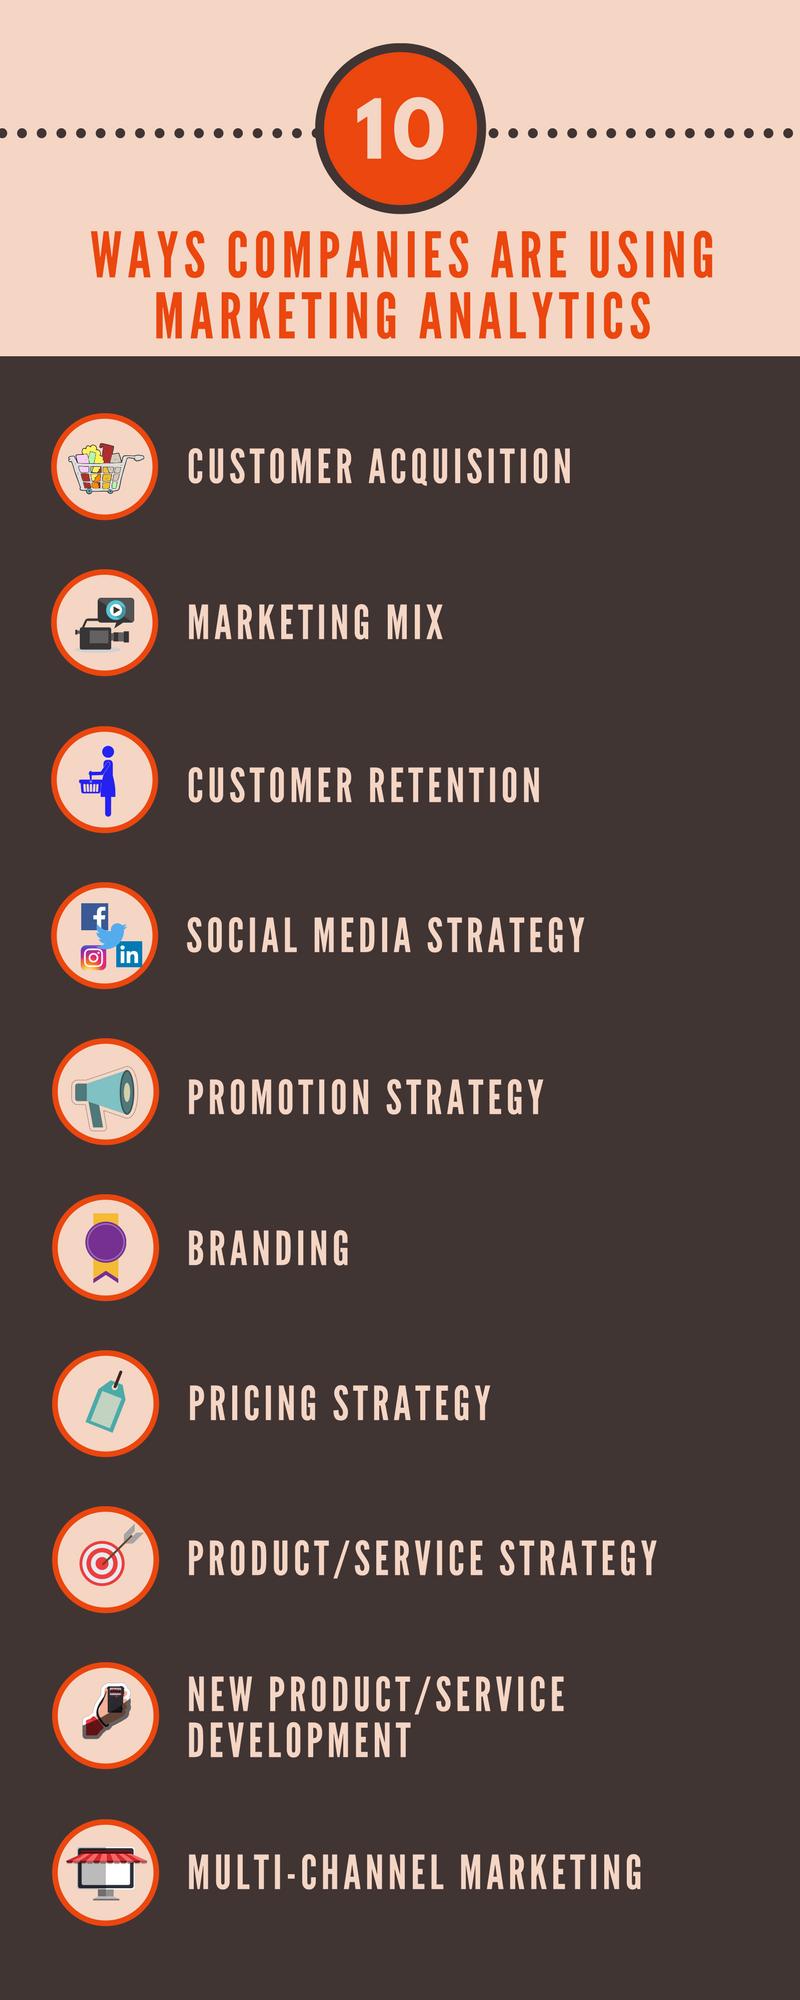 Marketing analytics.jpg